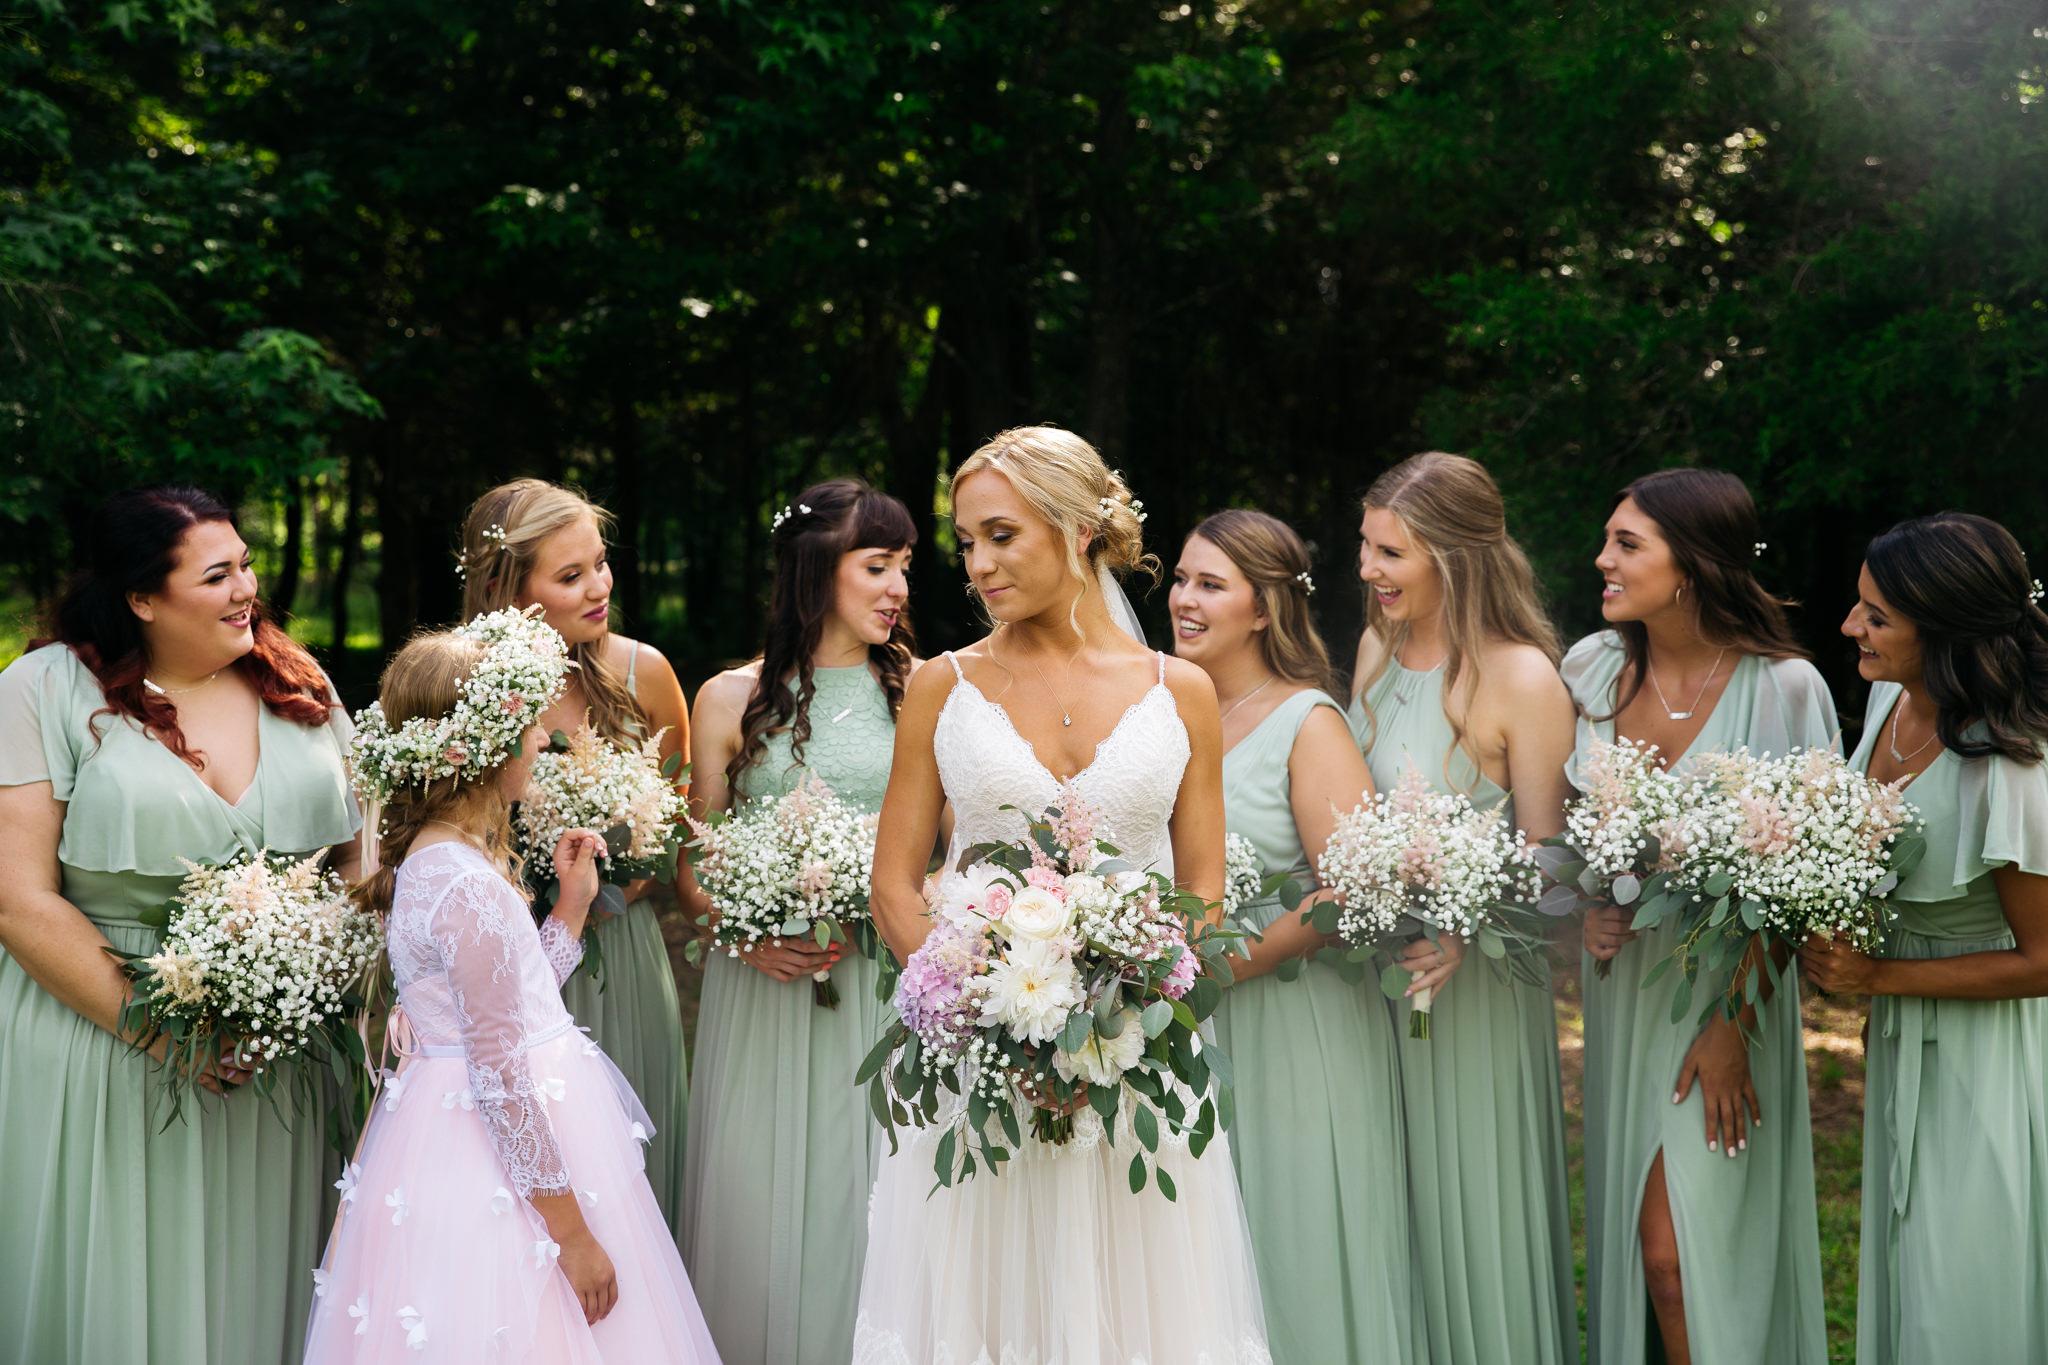 backyard-wedding-thewarmtharoundyou-lexy-branson-35.jpg